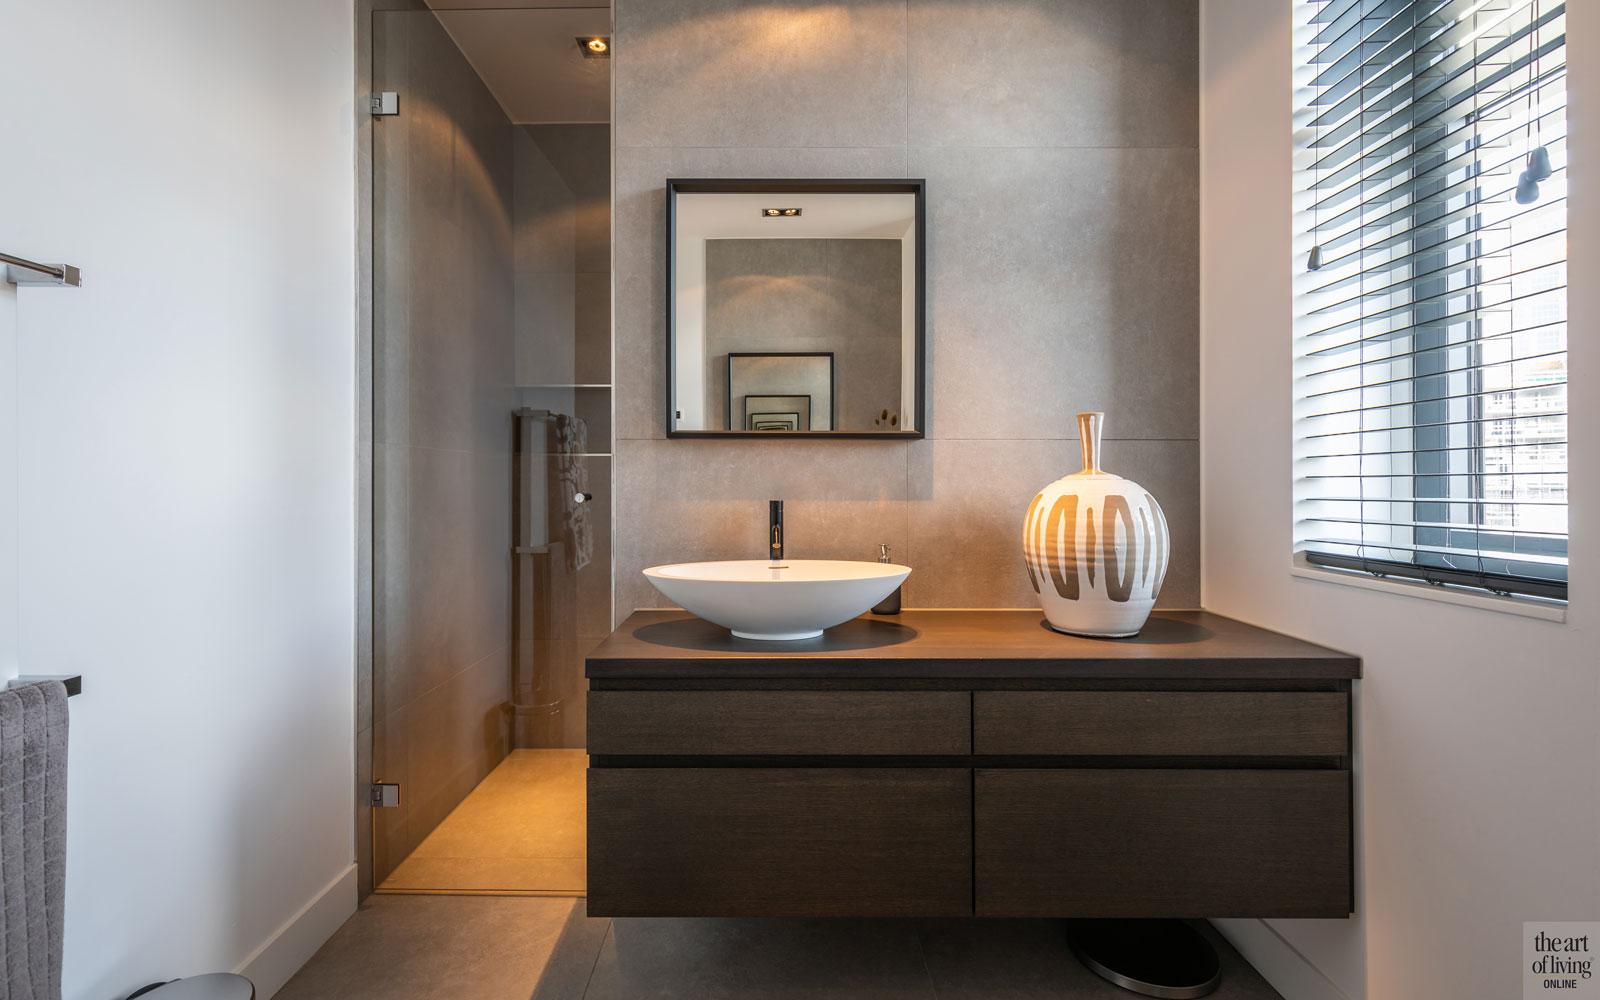 Wastafel, sanitair, shutters, strakke tweekapper, kabaz, C van der Grift